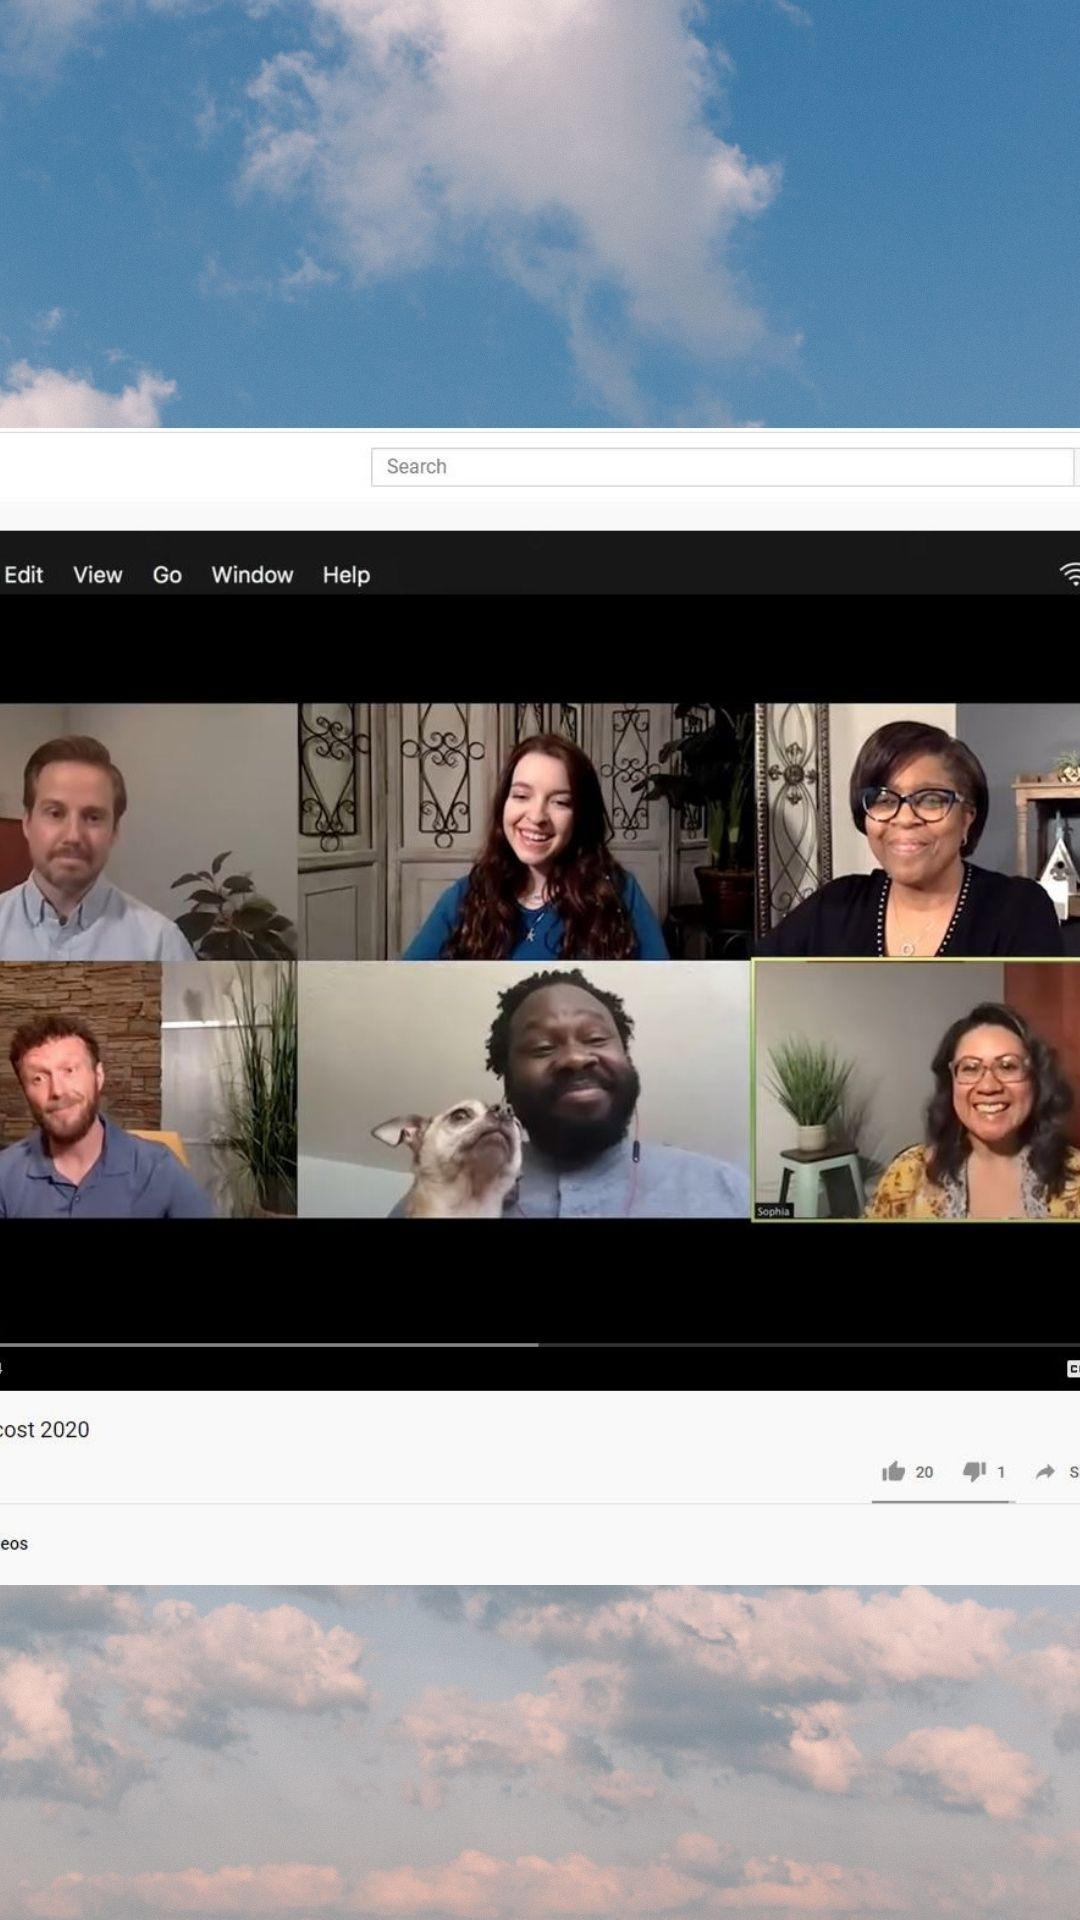 Pentecost 2020 zoom video image for UMC.org hero image